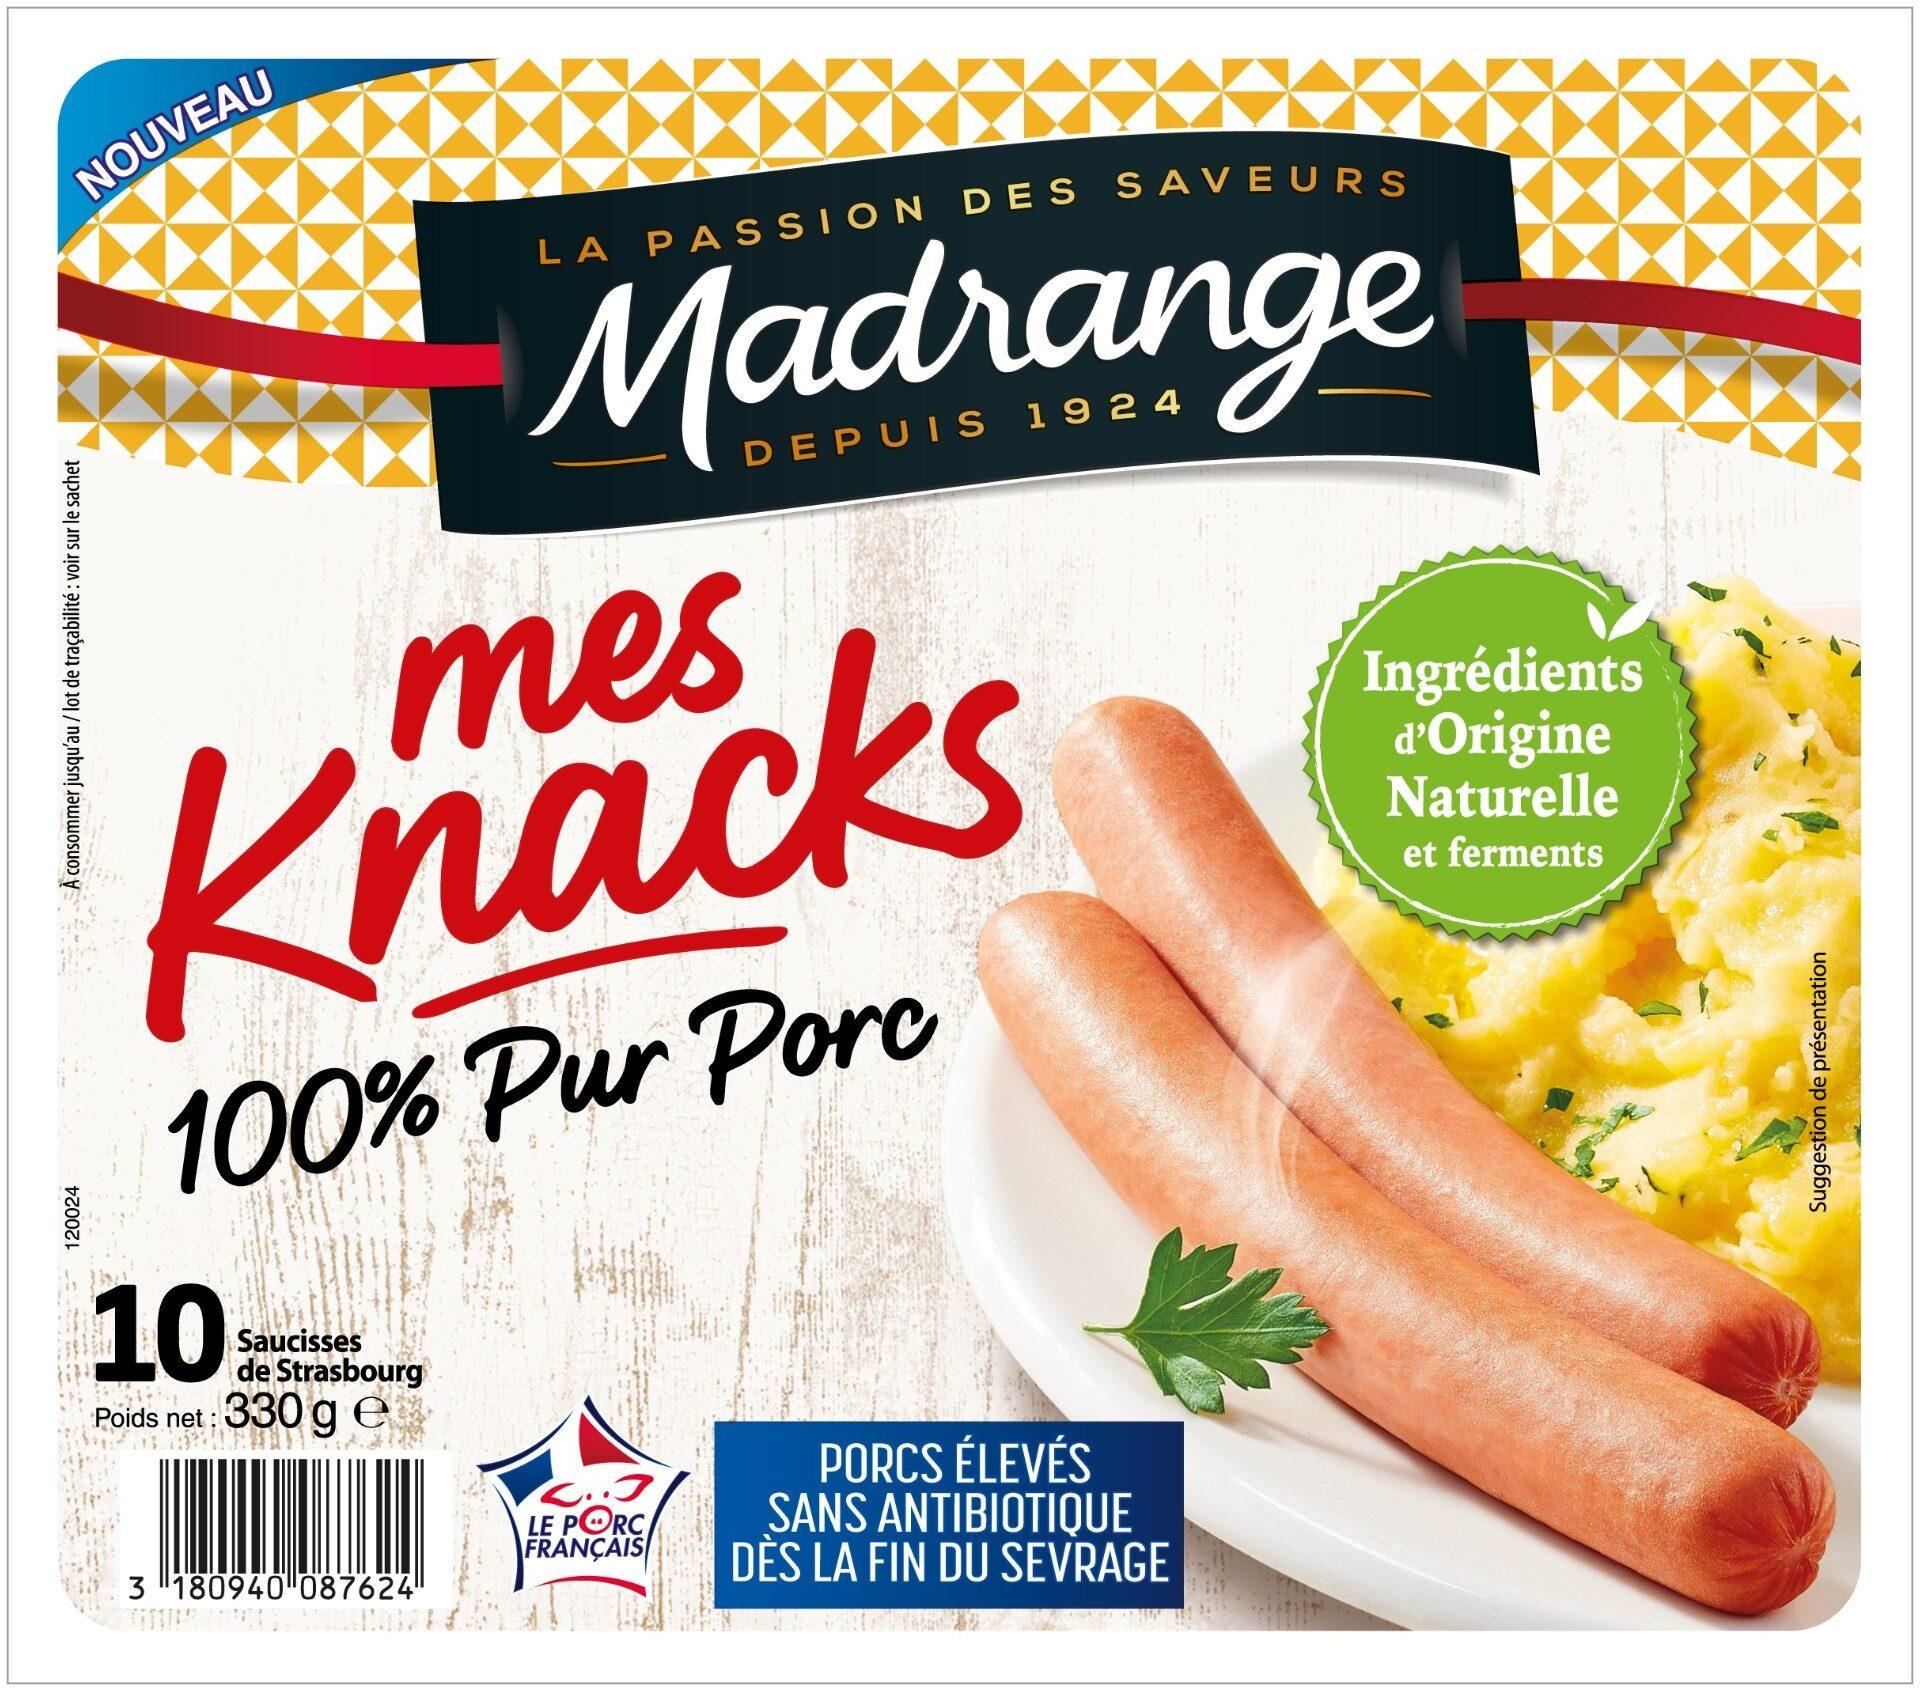 Knacks 100% Pur Porc - Product